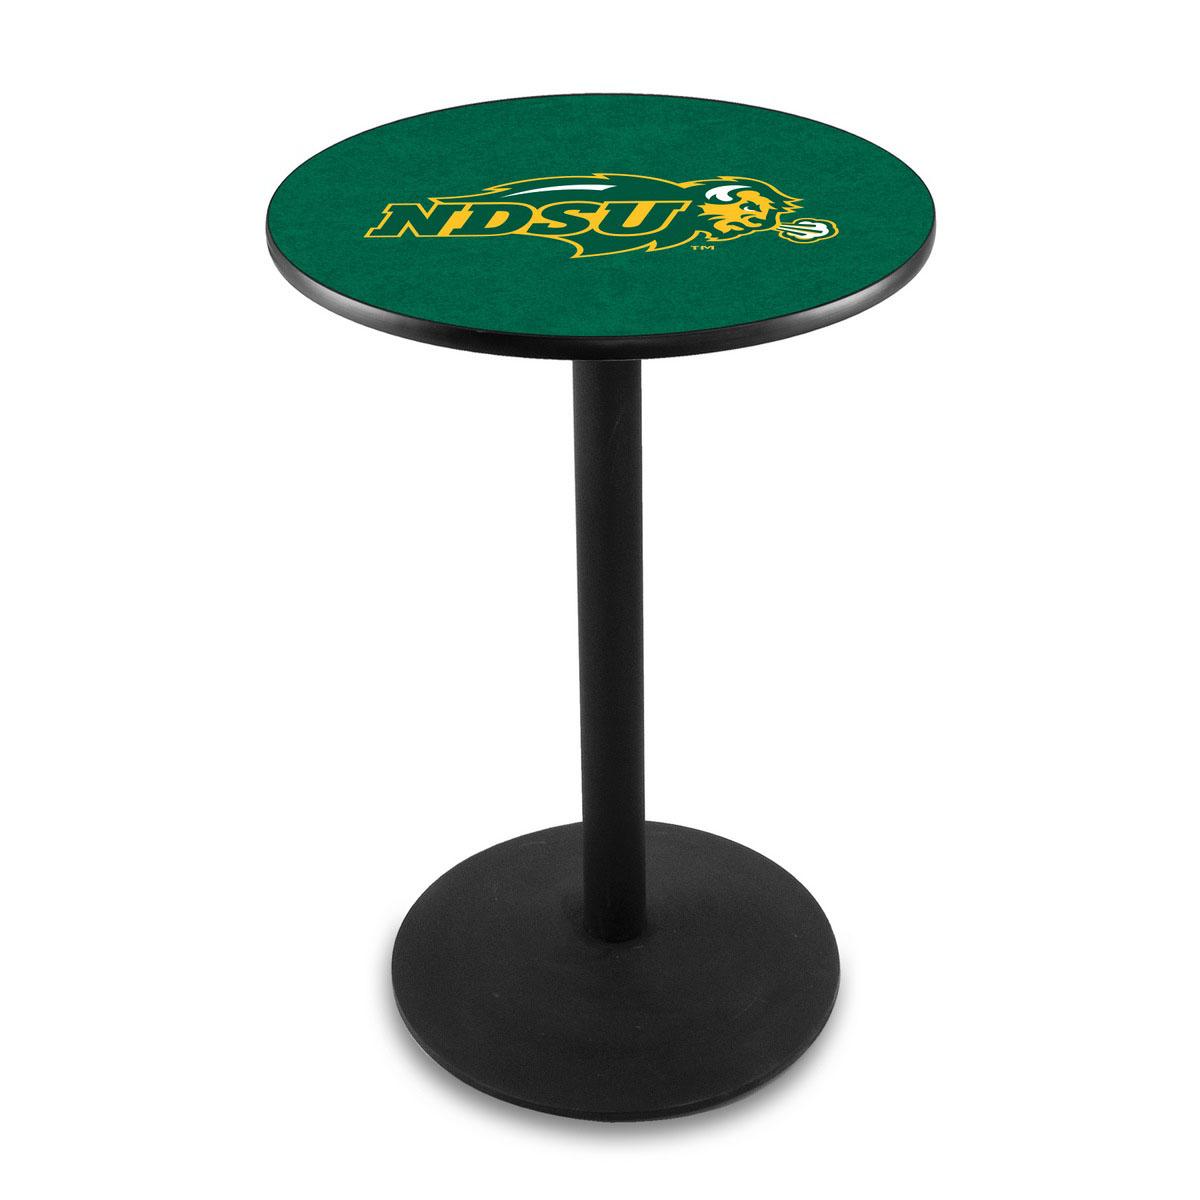 Buy North Dakota State University Gold Logo Pub Bar Table Round Stand Product Photo